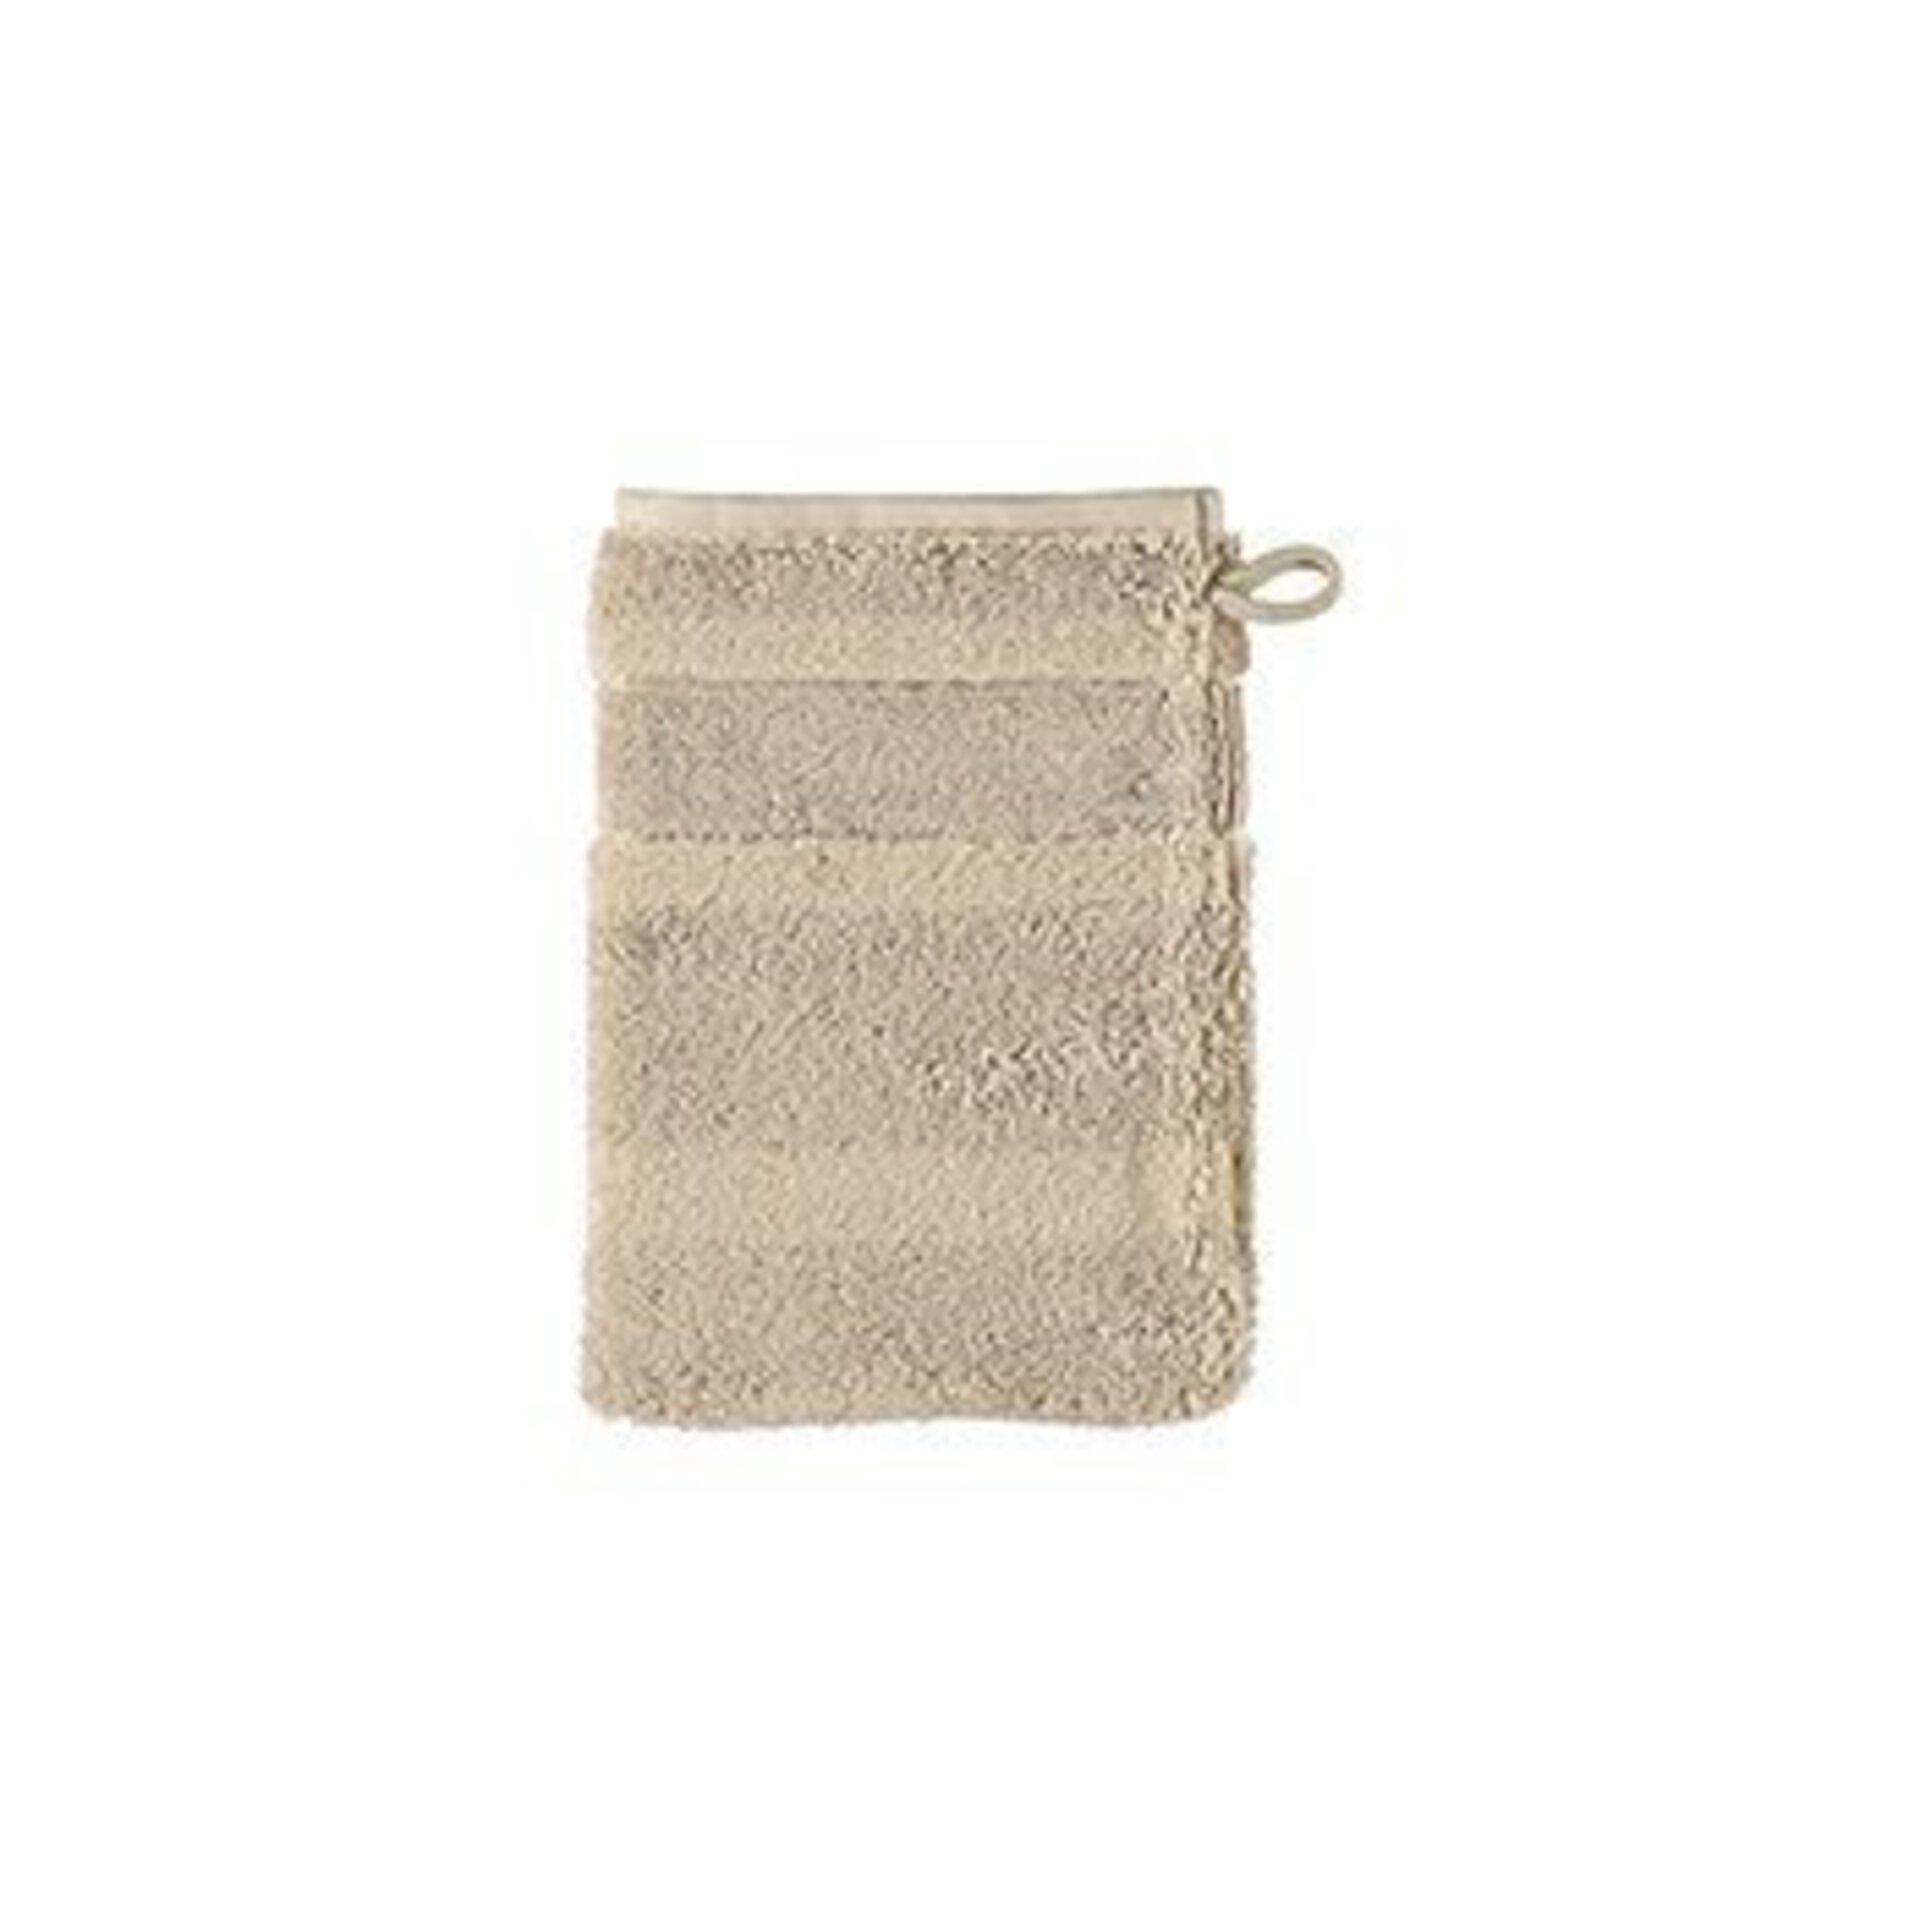 Waschhandschuh Noblesse² Cawö Textil 16 x 22 cm